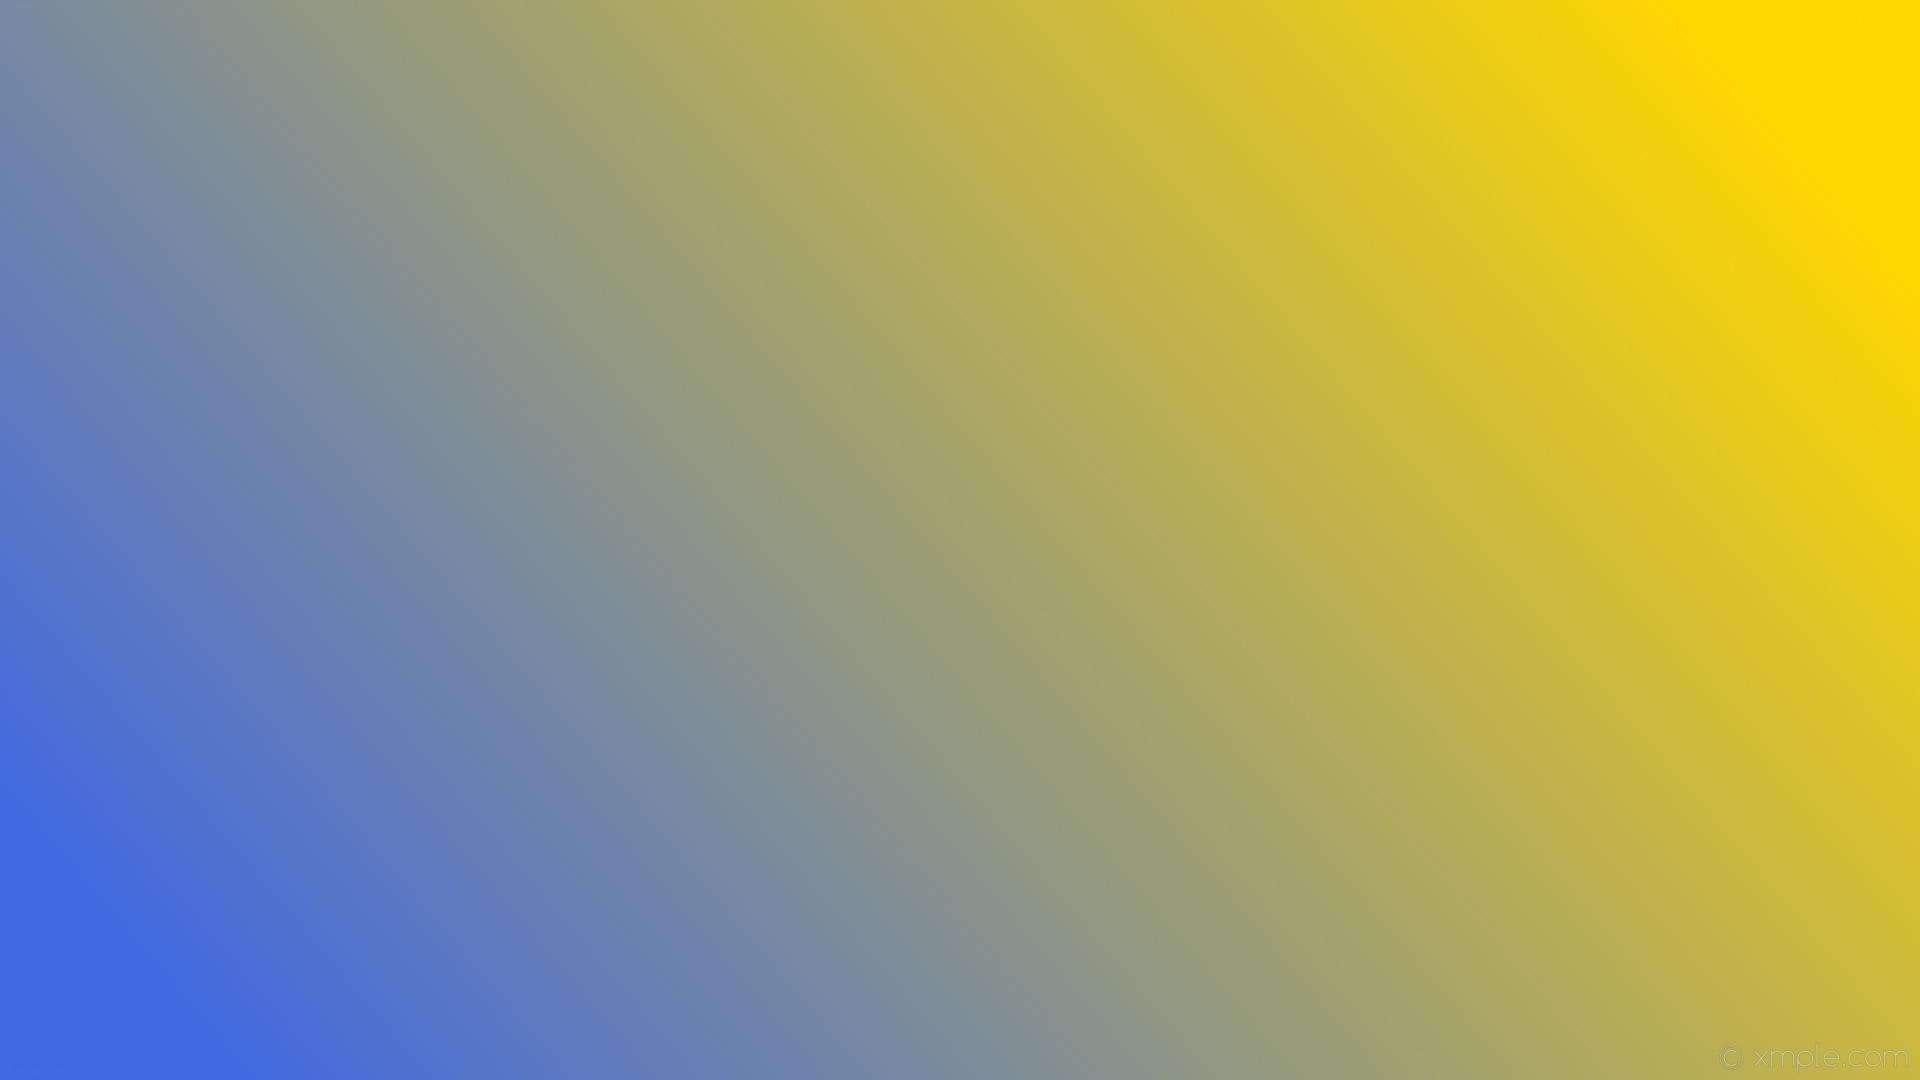 wallpaper linear yellow gradient blue royal blue gold #4169e1 #ffd700 195°